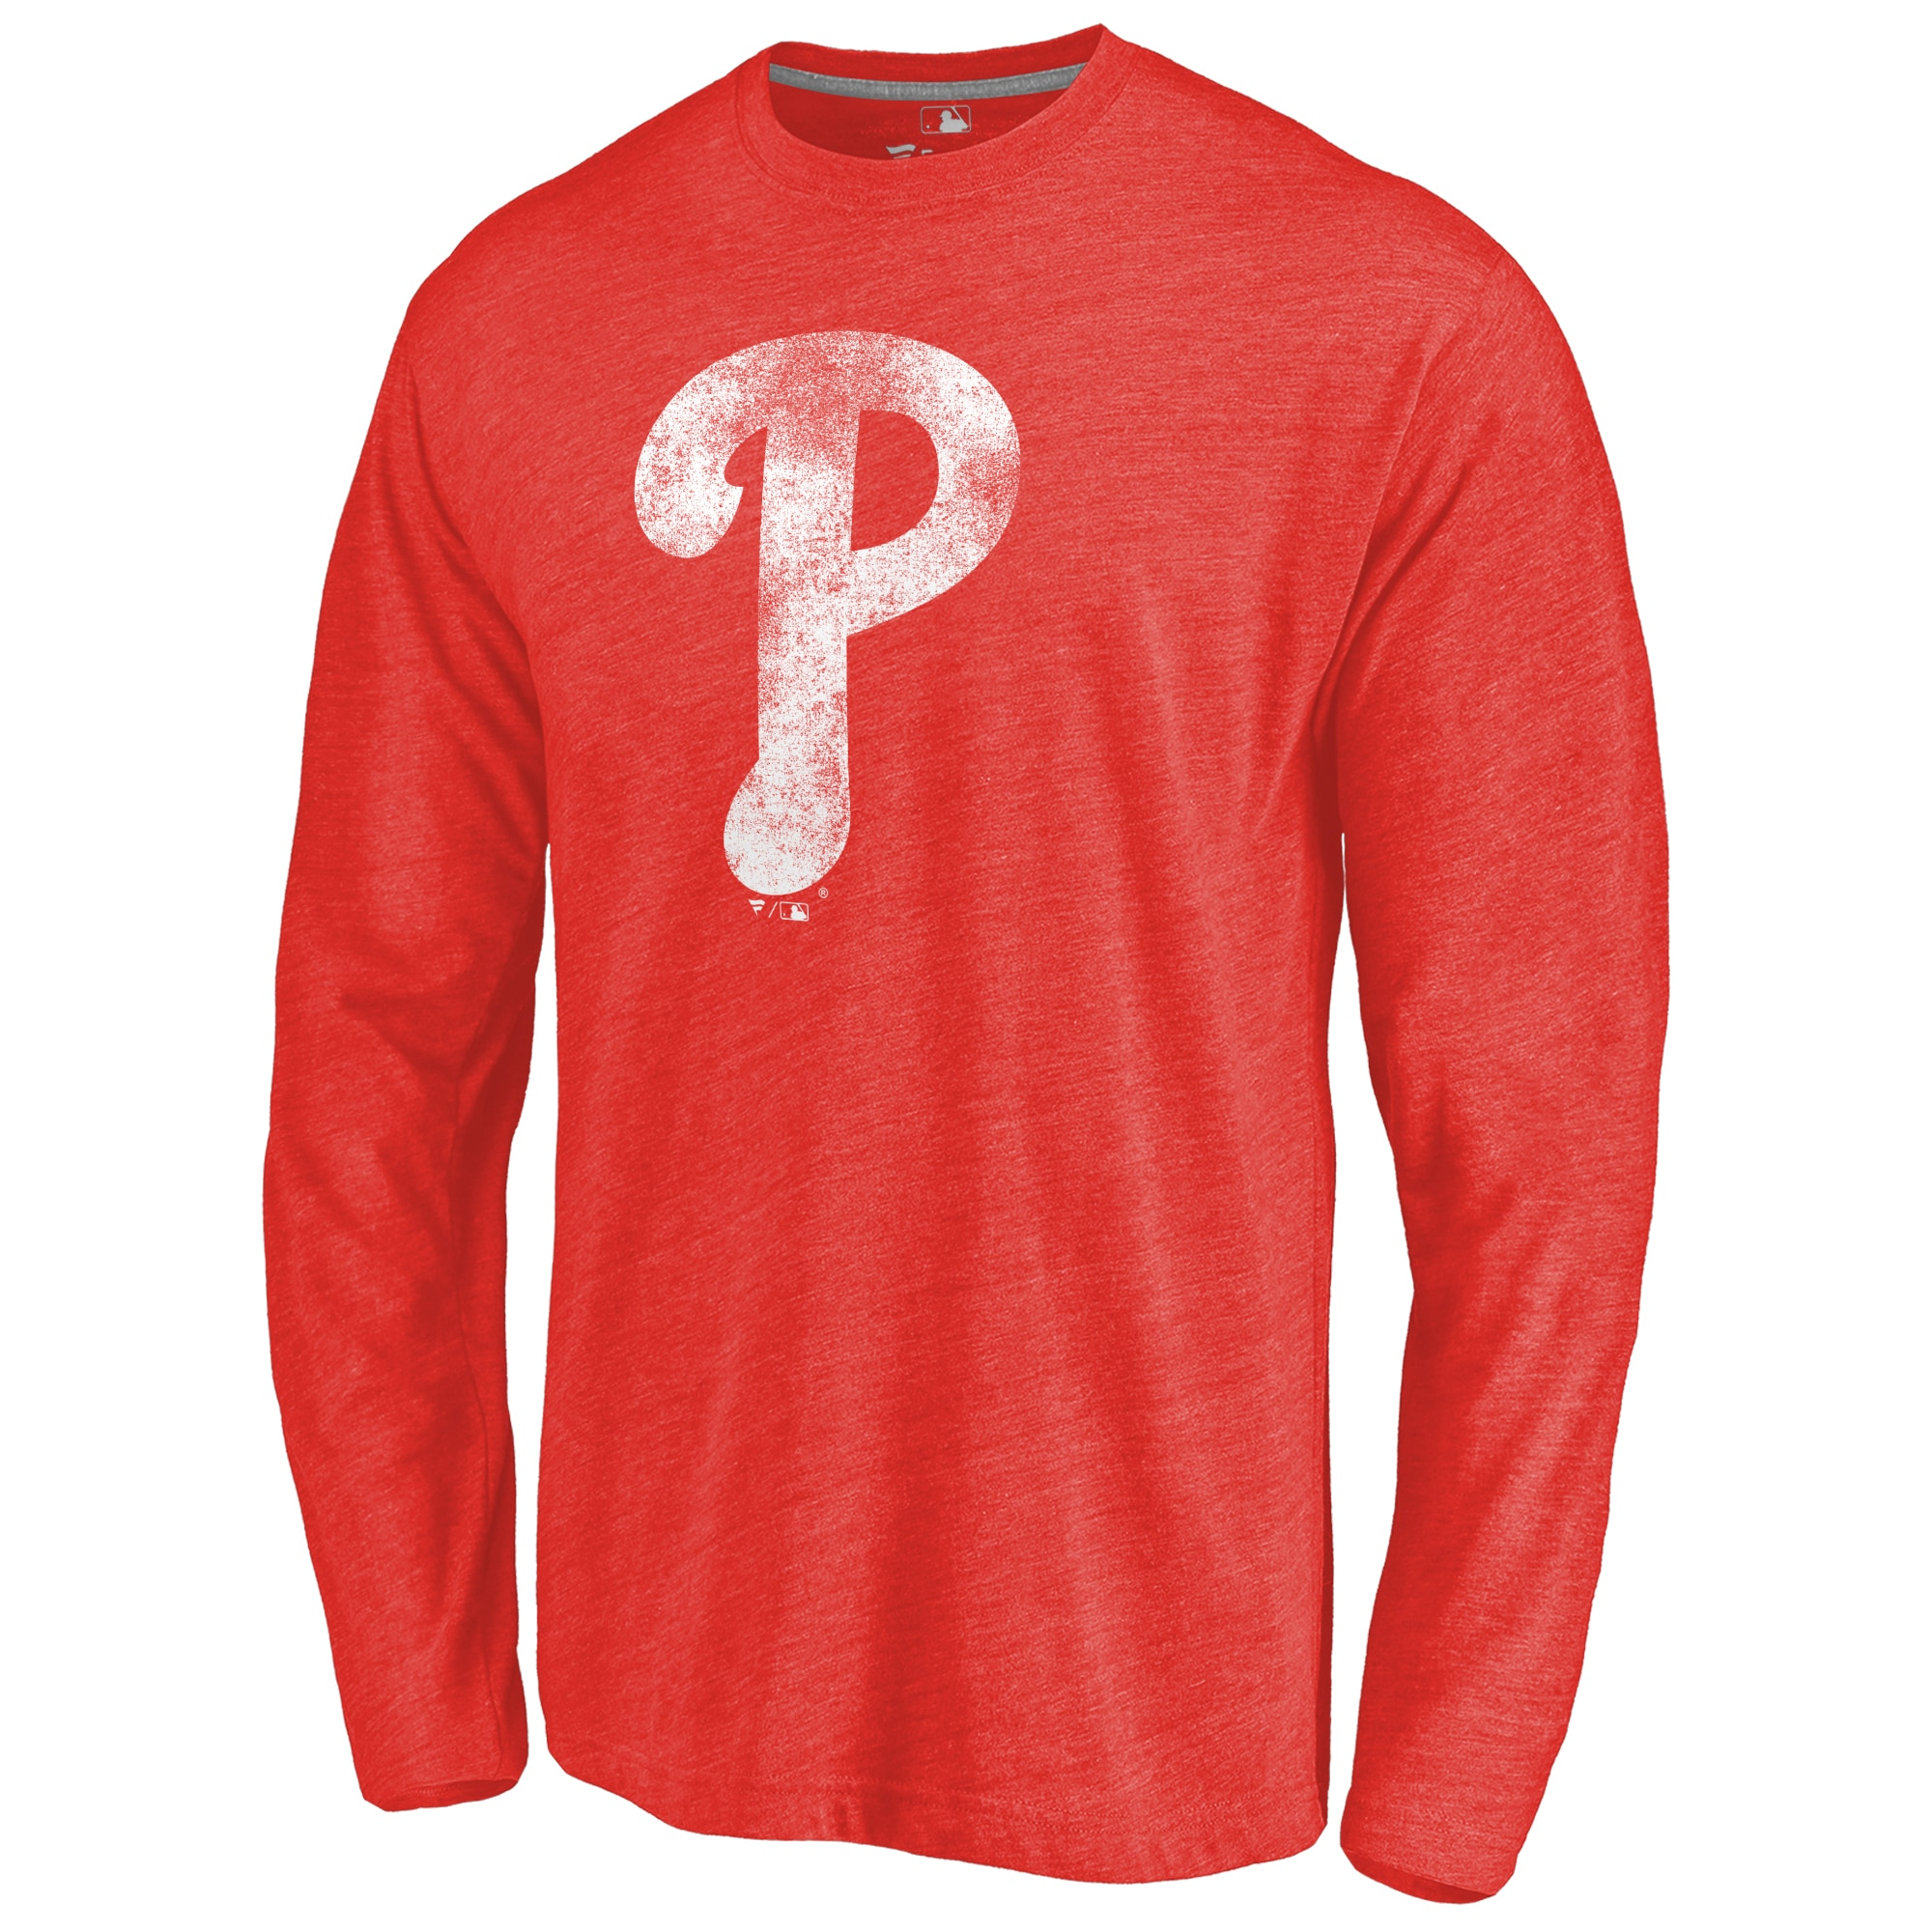 Philadelphia Phillies Distressed Team Long Sleeve Tri-Blend T-shirt - Red